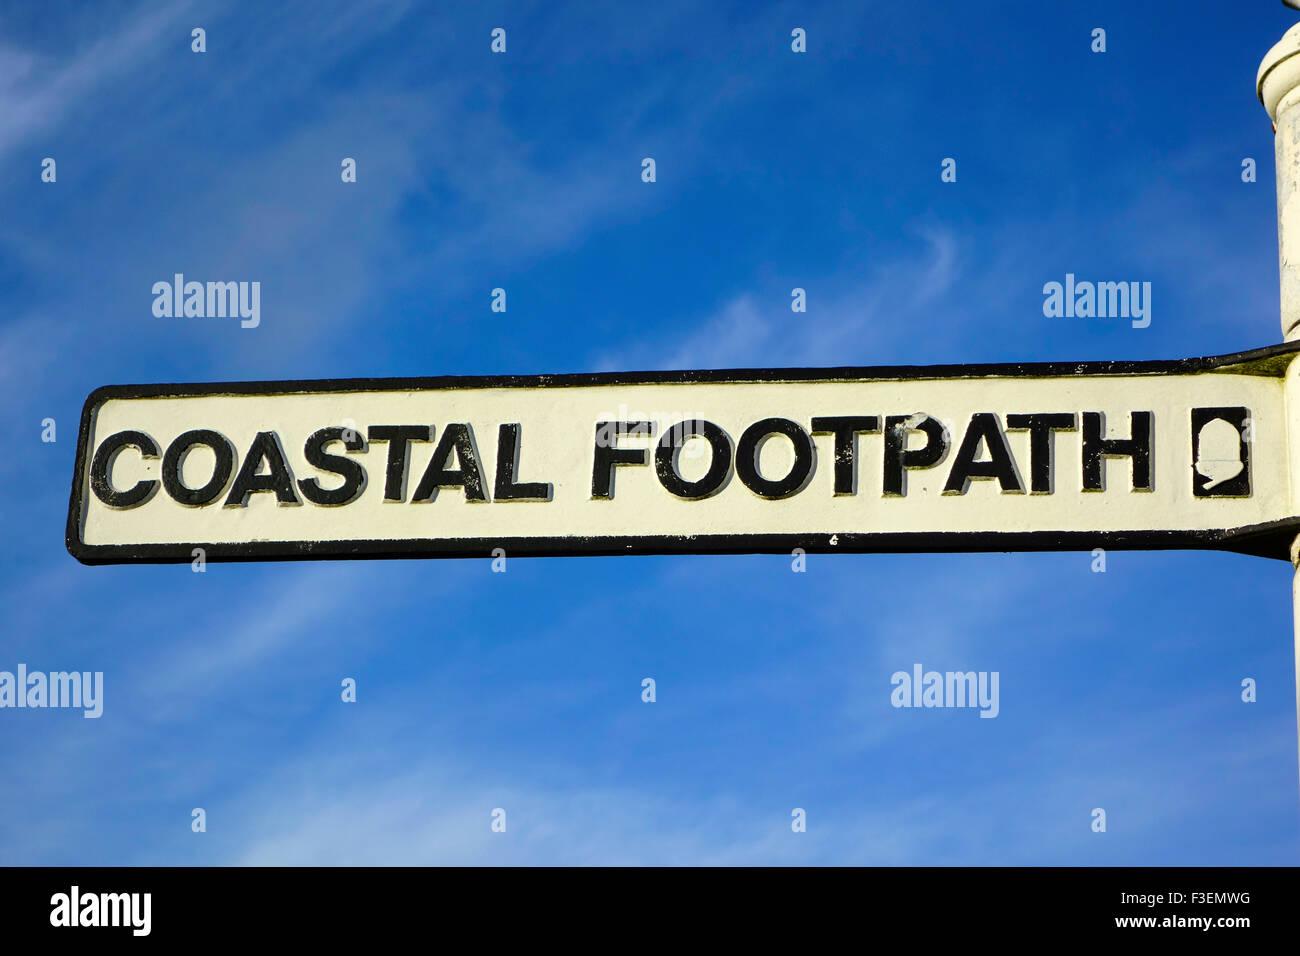 Coastal Footpath Sign for the South West Coast Path, Cornwall, England, UK - Stock Image